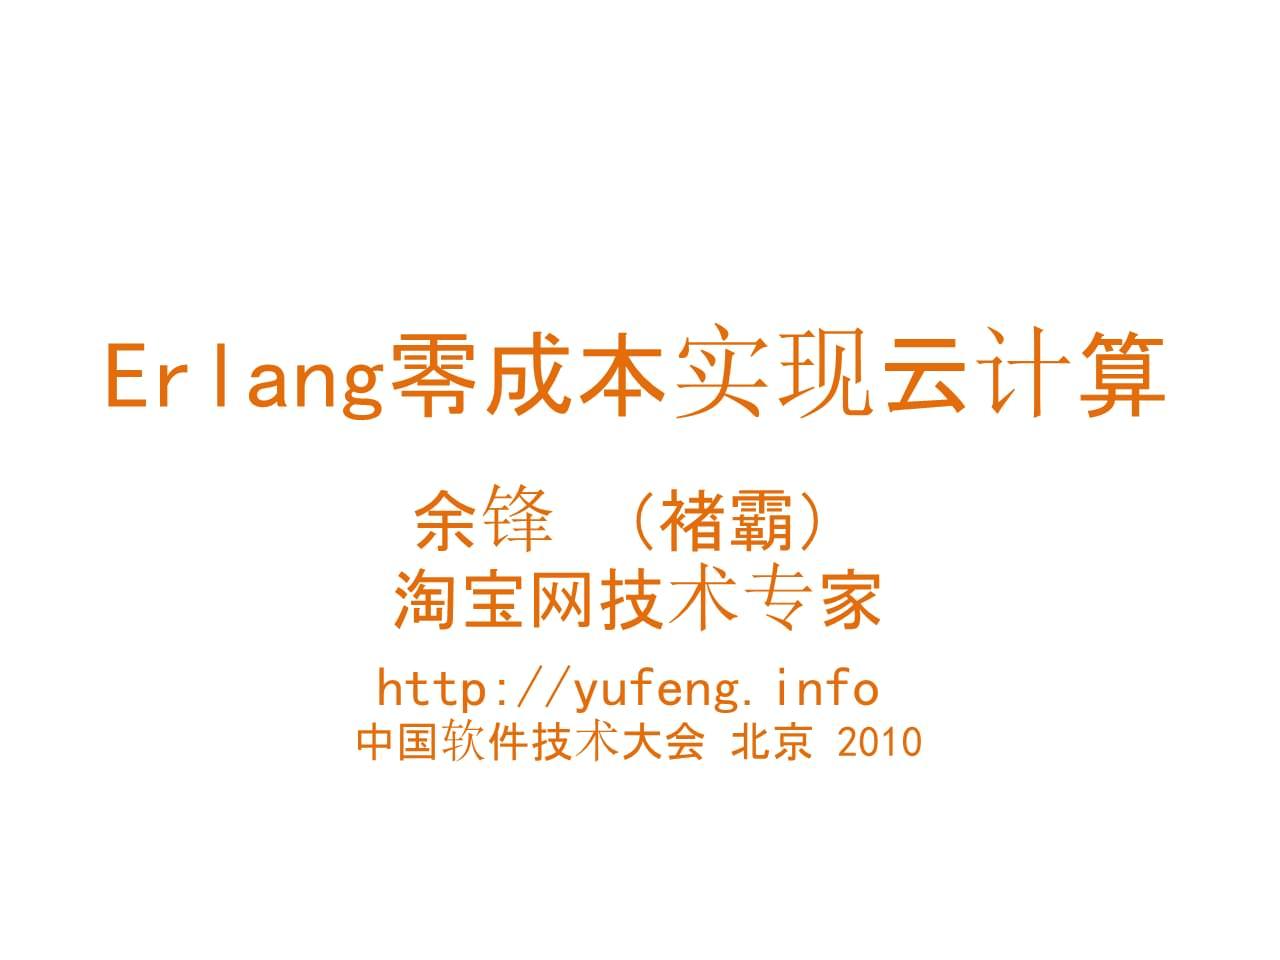 Erlang零成本实现云计算课件.pptx